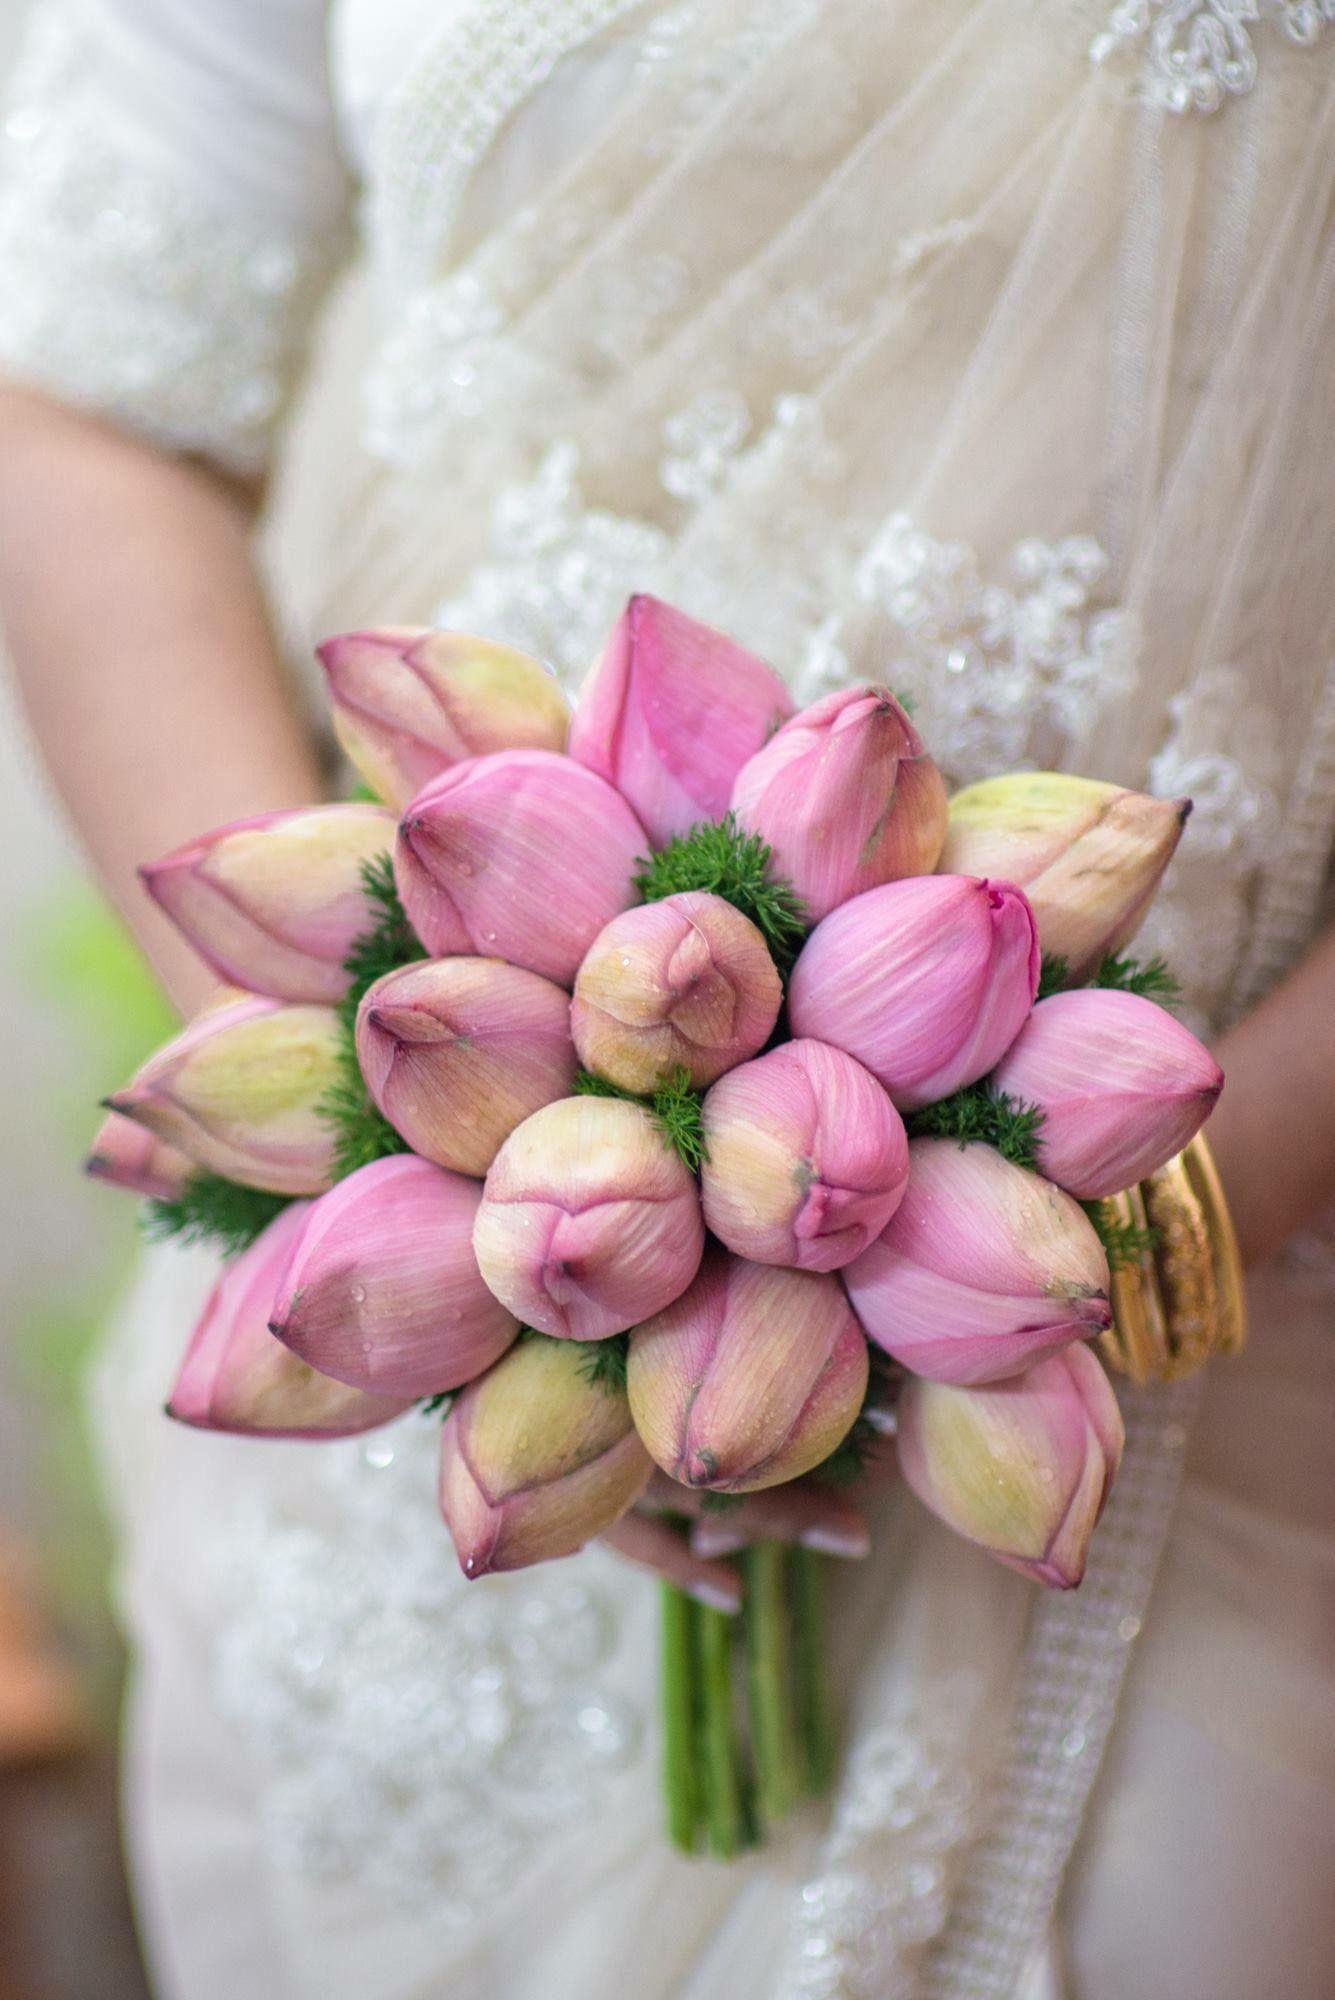 My Wedding Bouquet Wedding Lotus Flower Bouquet Wedding Wedding Bouquet Cost Daisy Bouquet Wedding